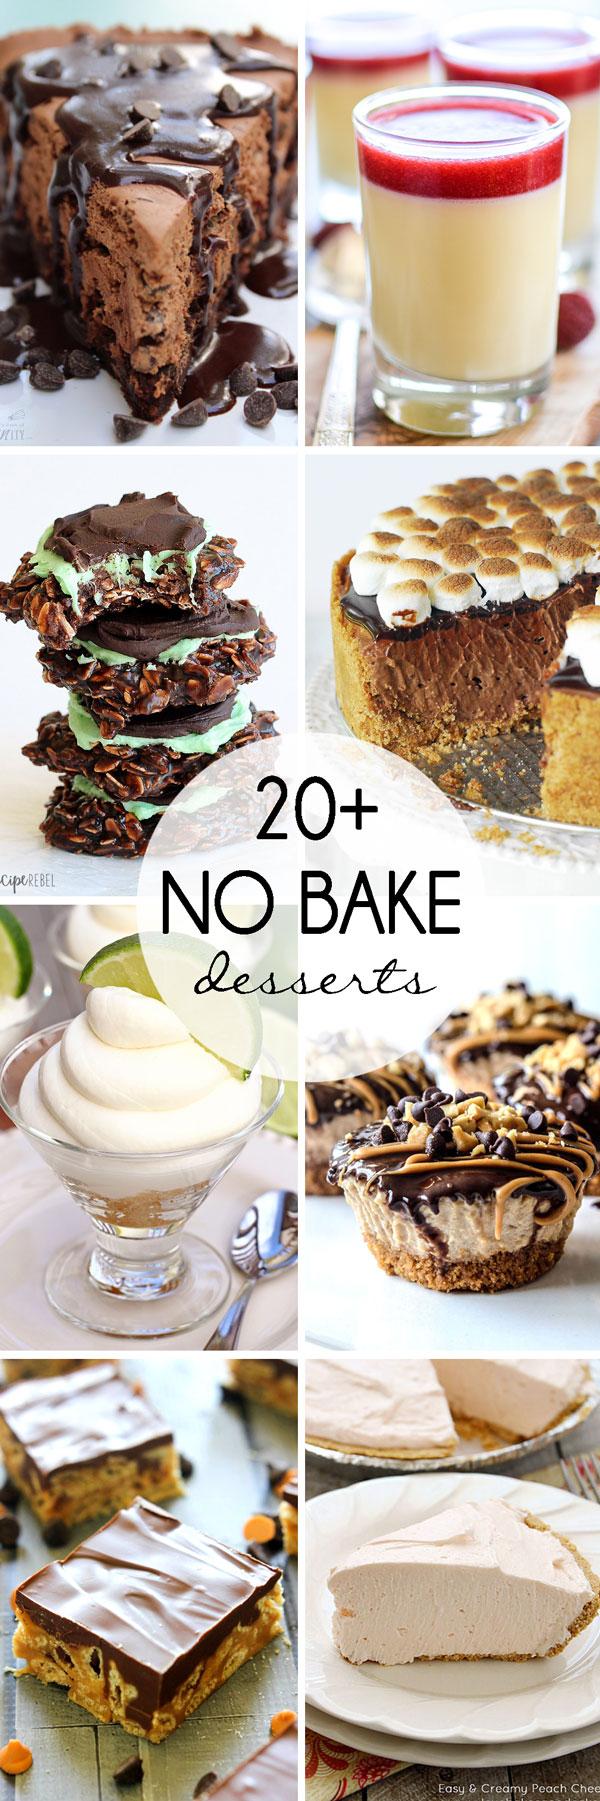 20+ No Bake Desserts | White Lights on Wednesday